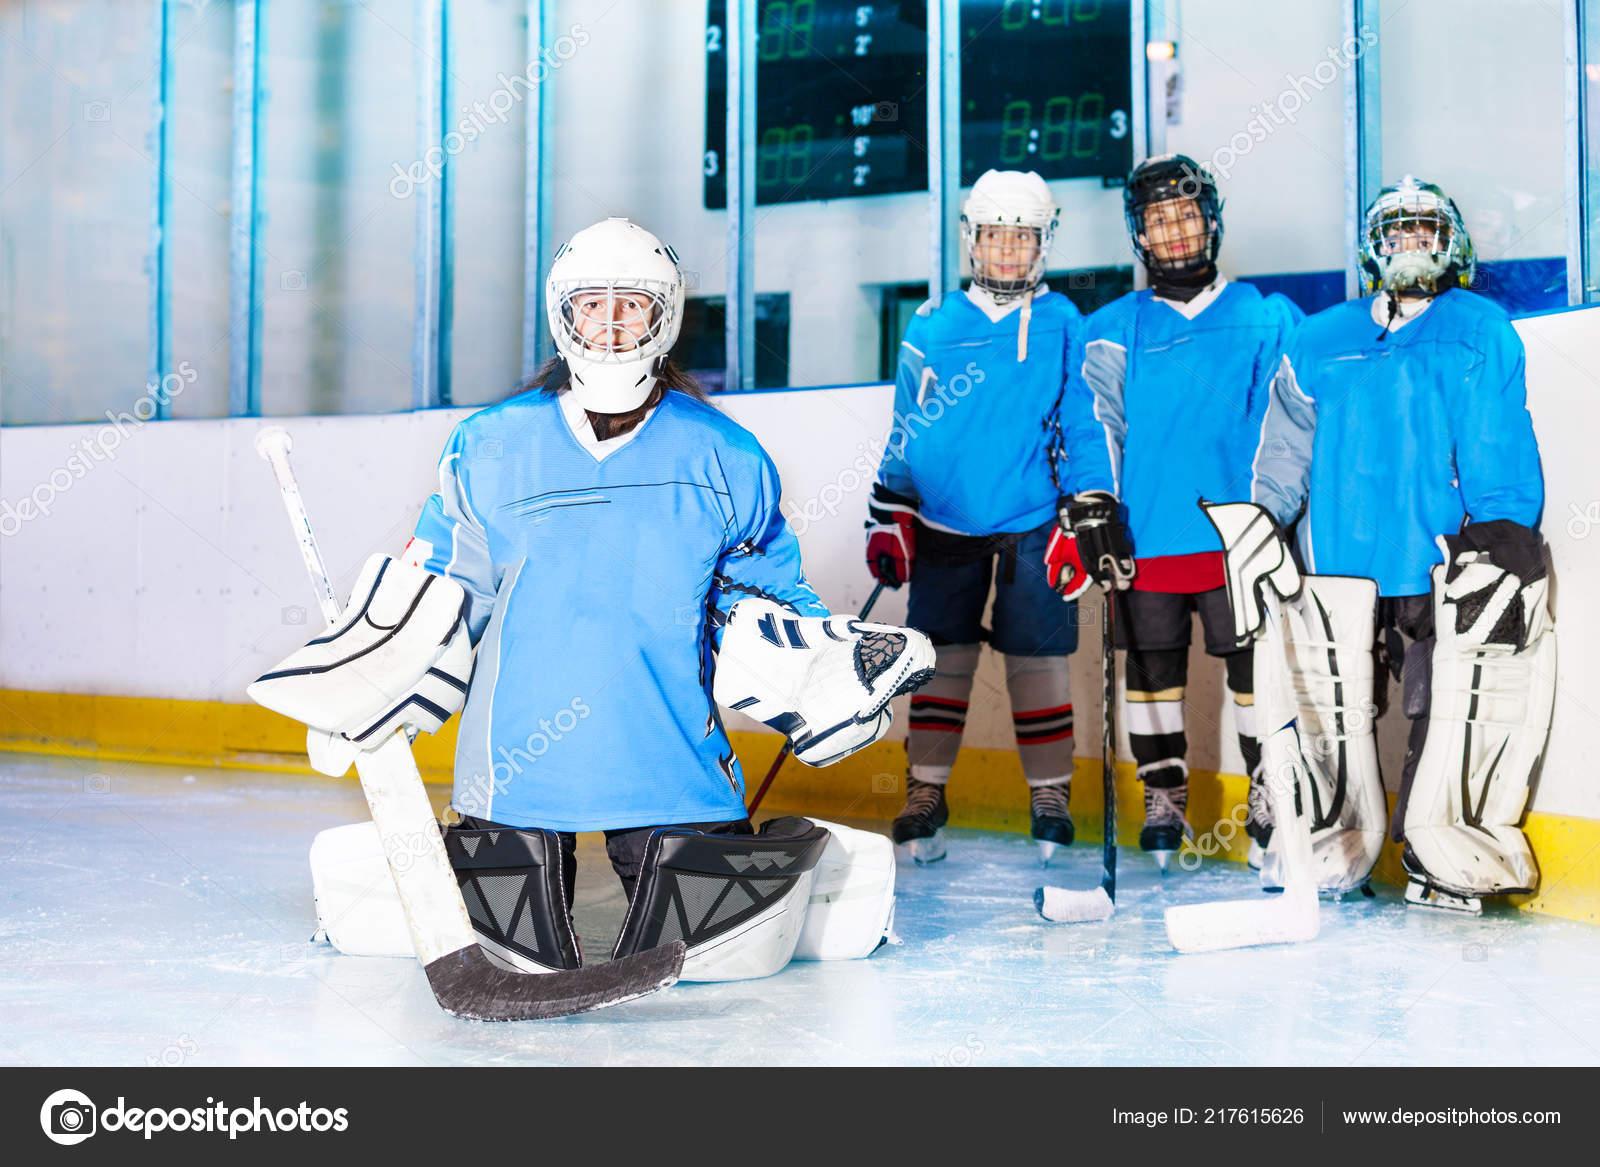 Portrait Teenage Girl Wearing Hockey Goalie Uniform Standing